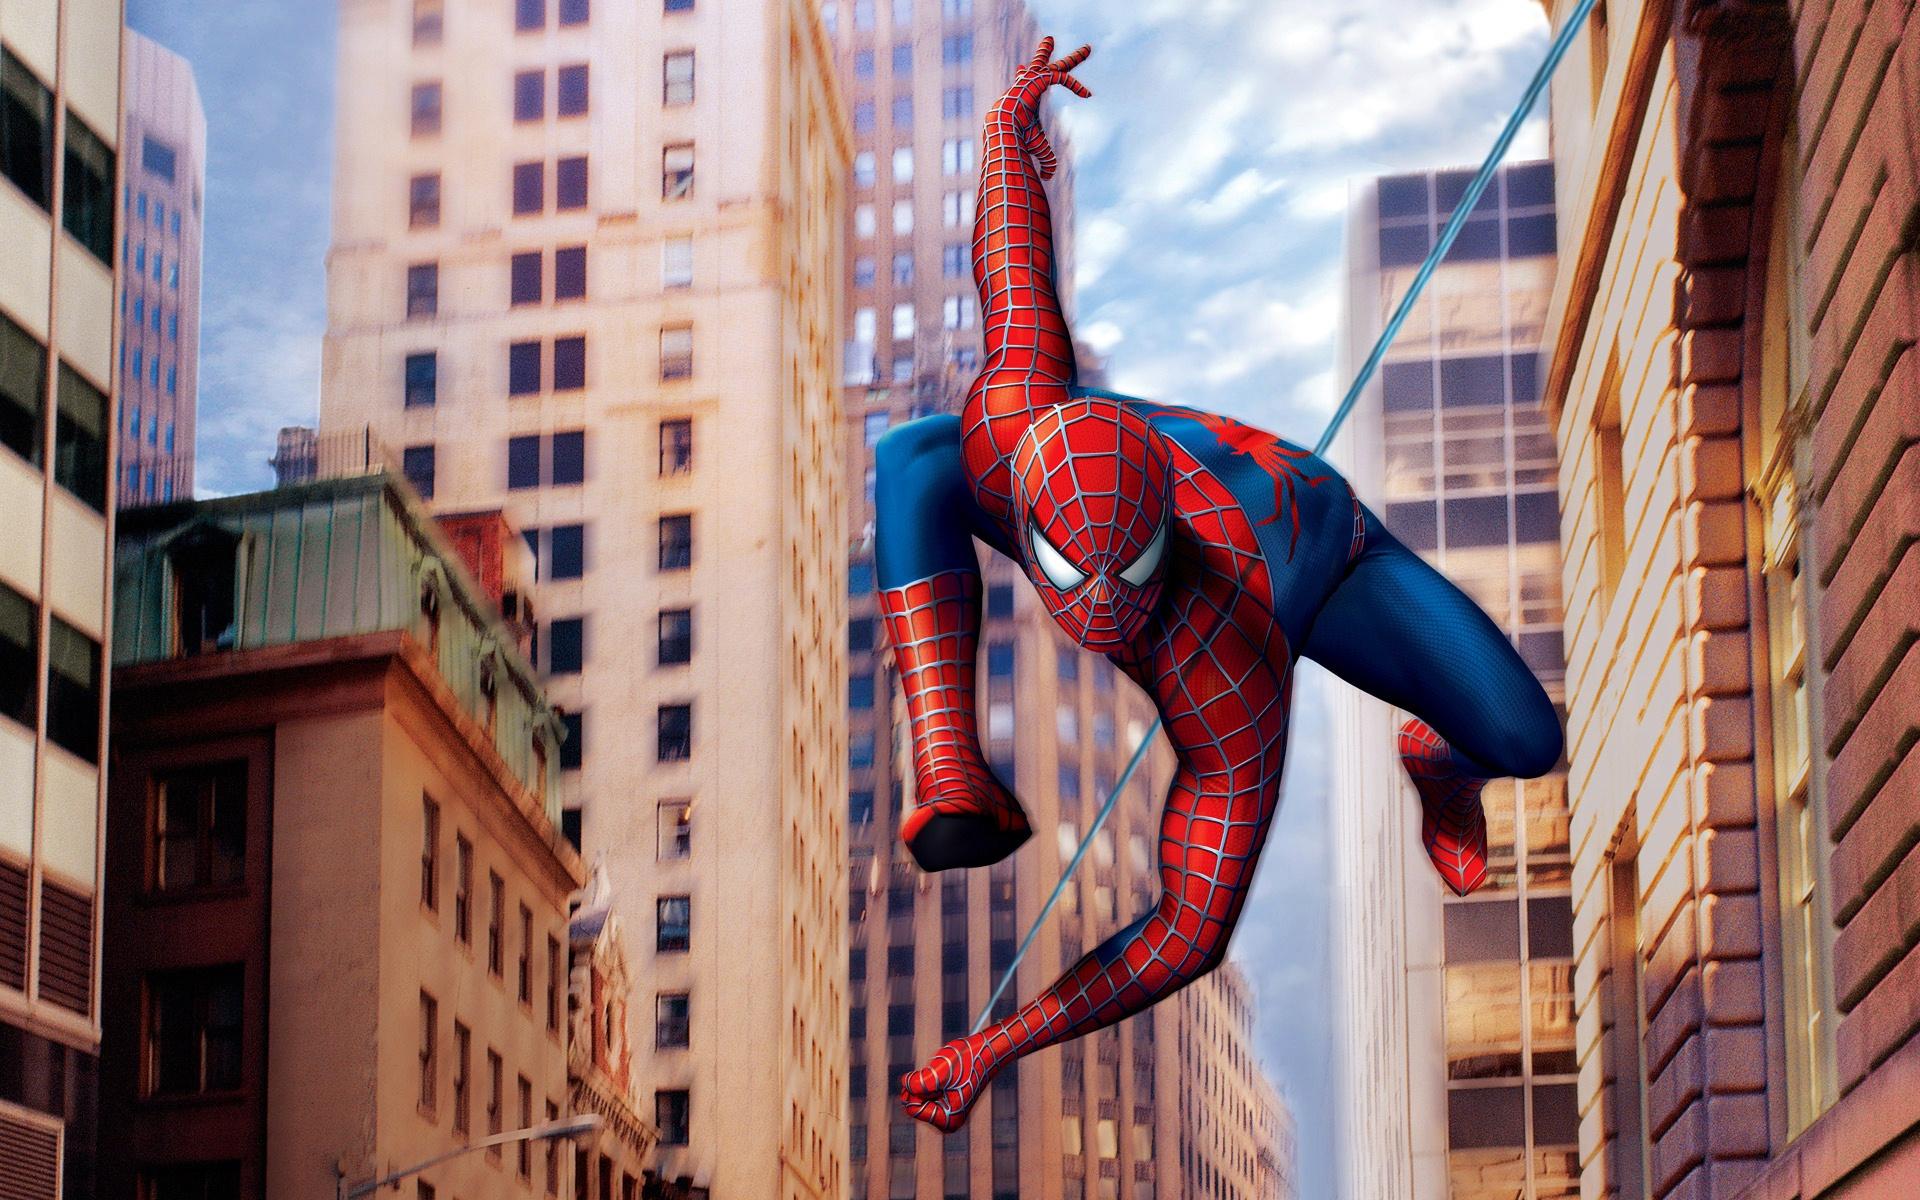 Free 3d Wallpapers Mobile Phones Spiderman Latest Wallpapers Hd Wallpapers Id 9620